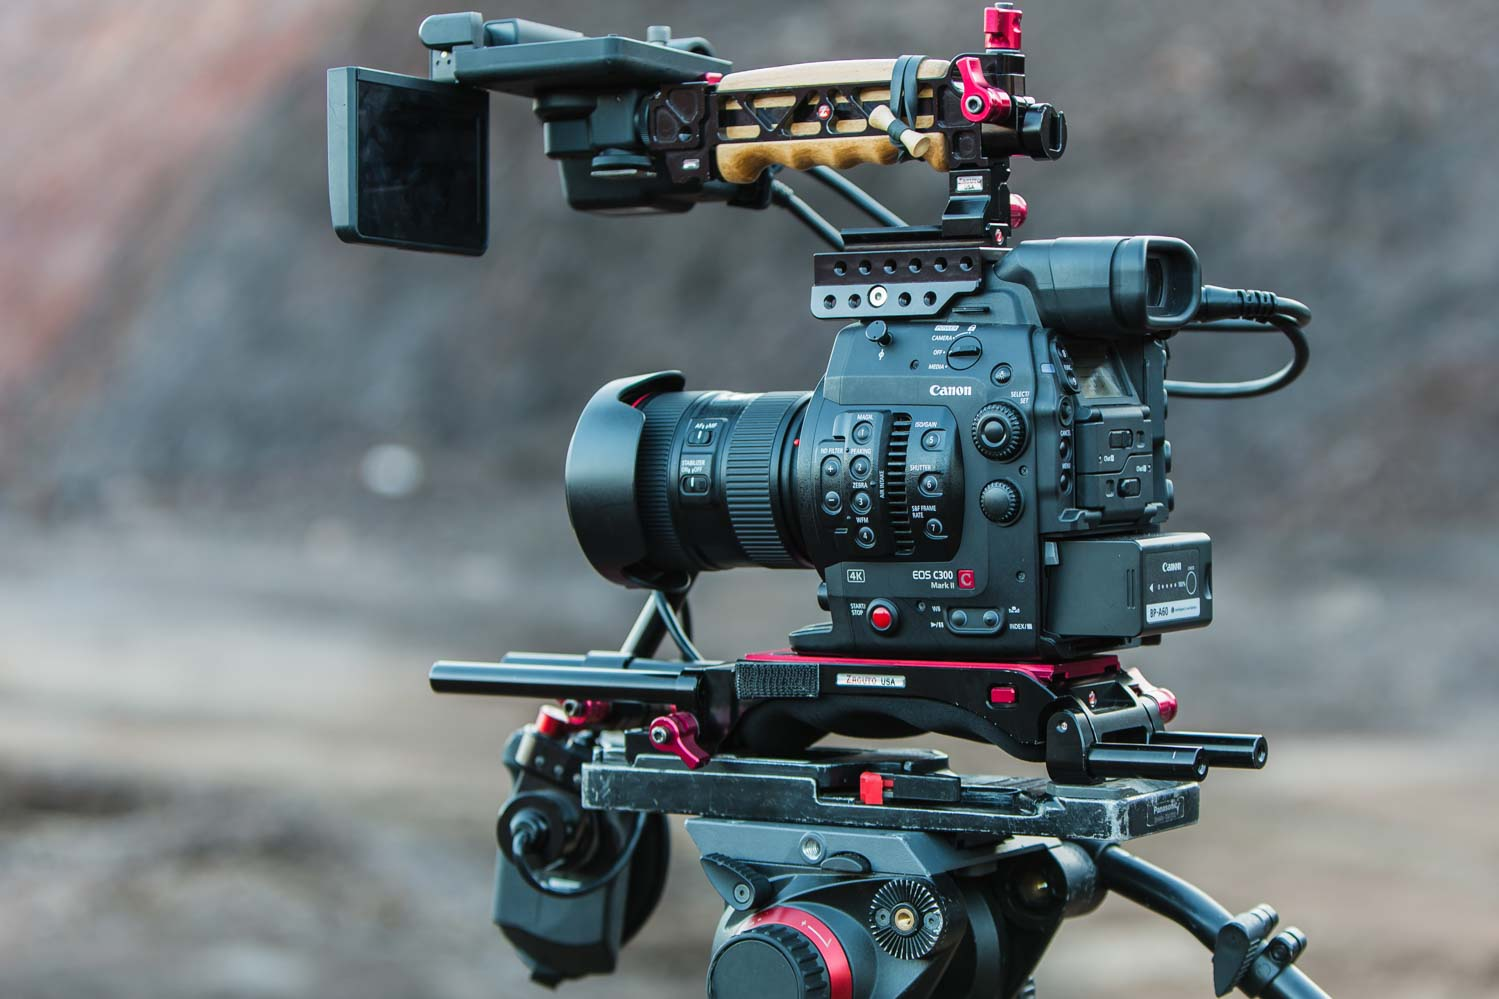 Canon C200 Vs C300